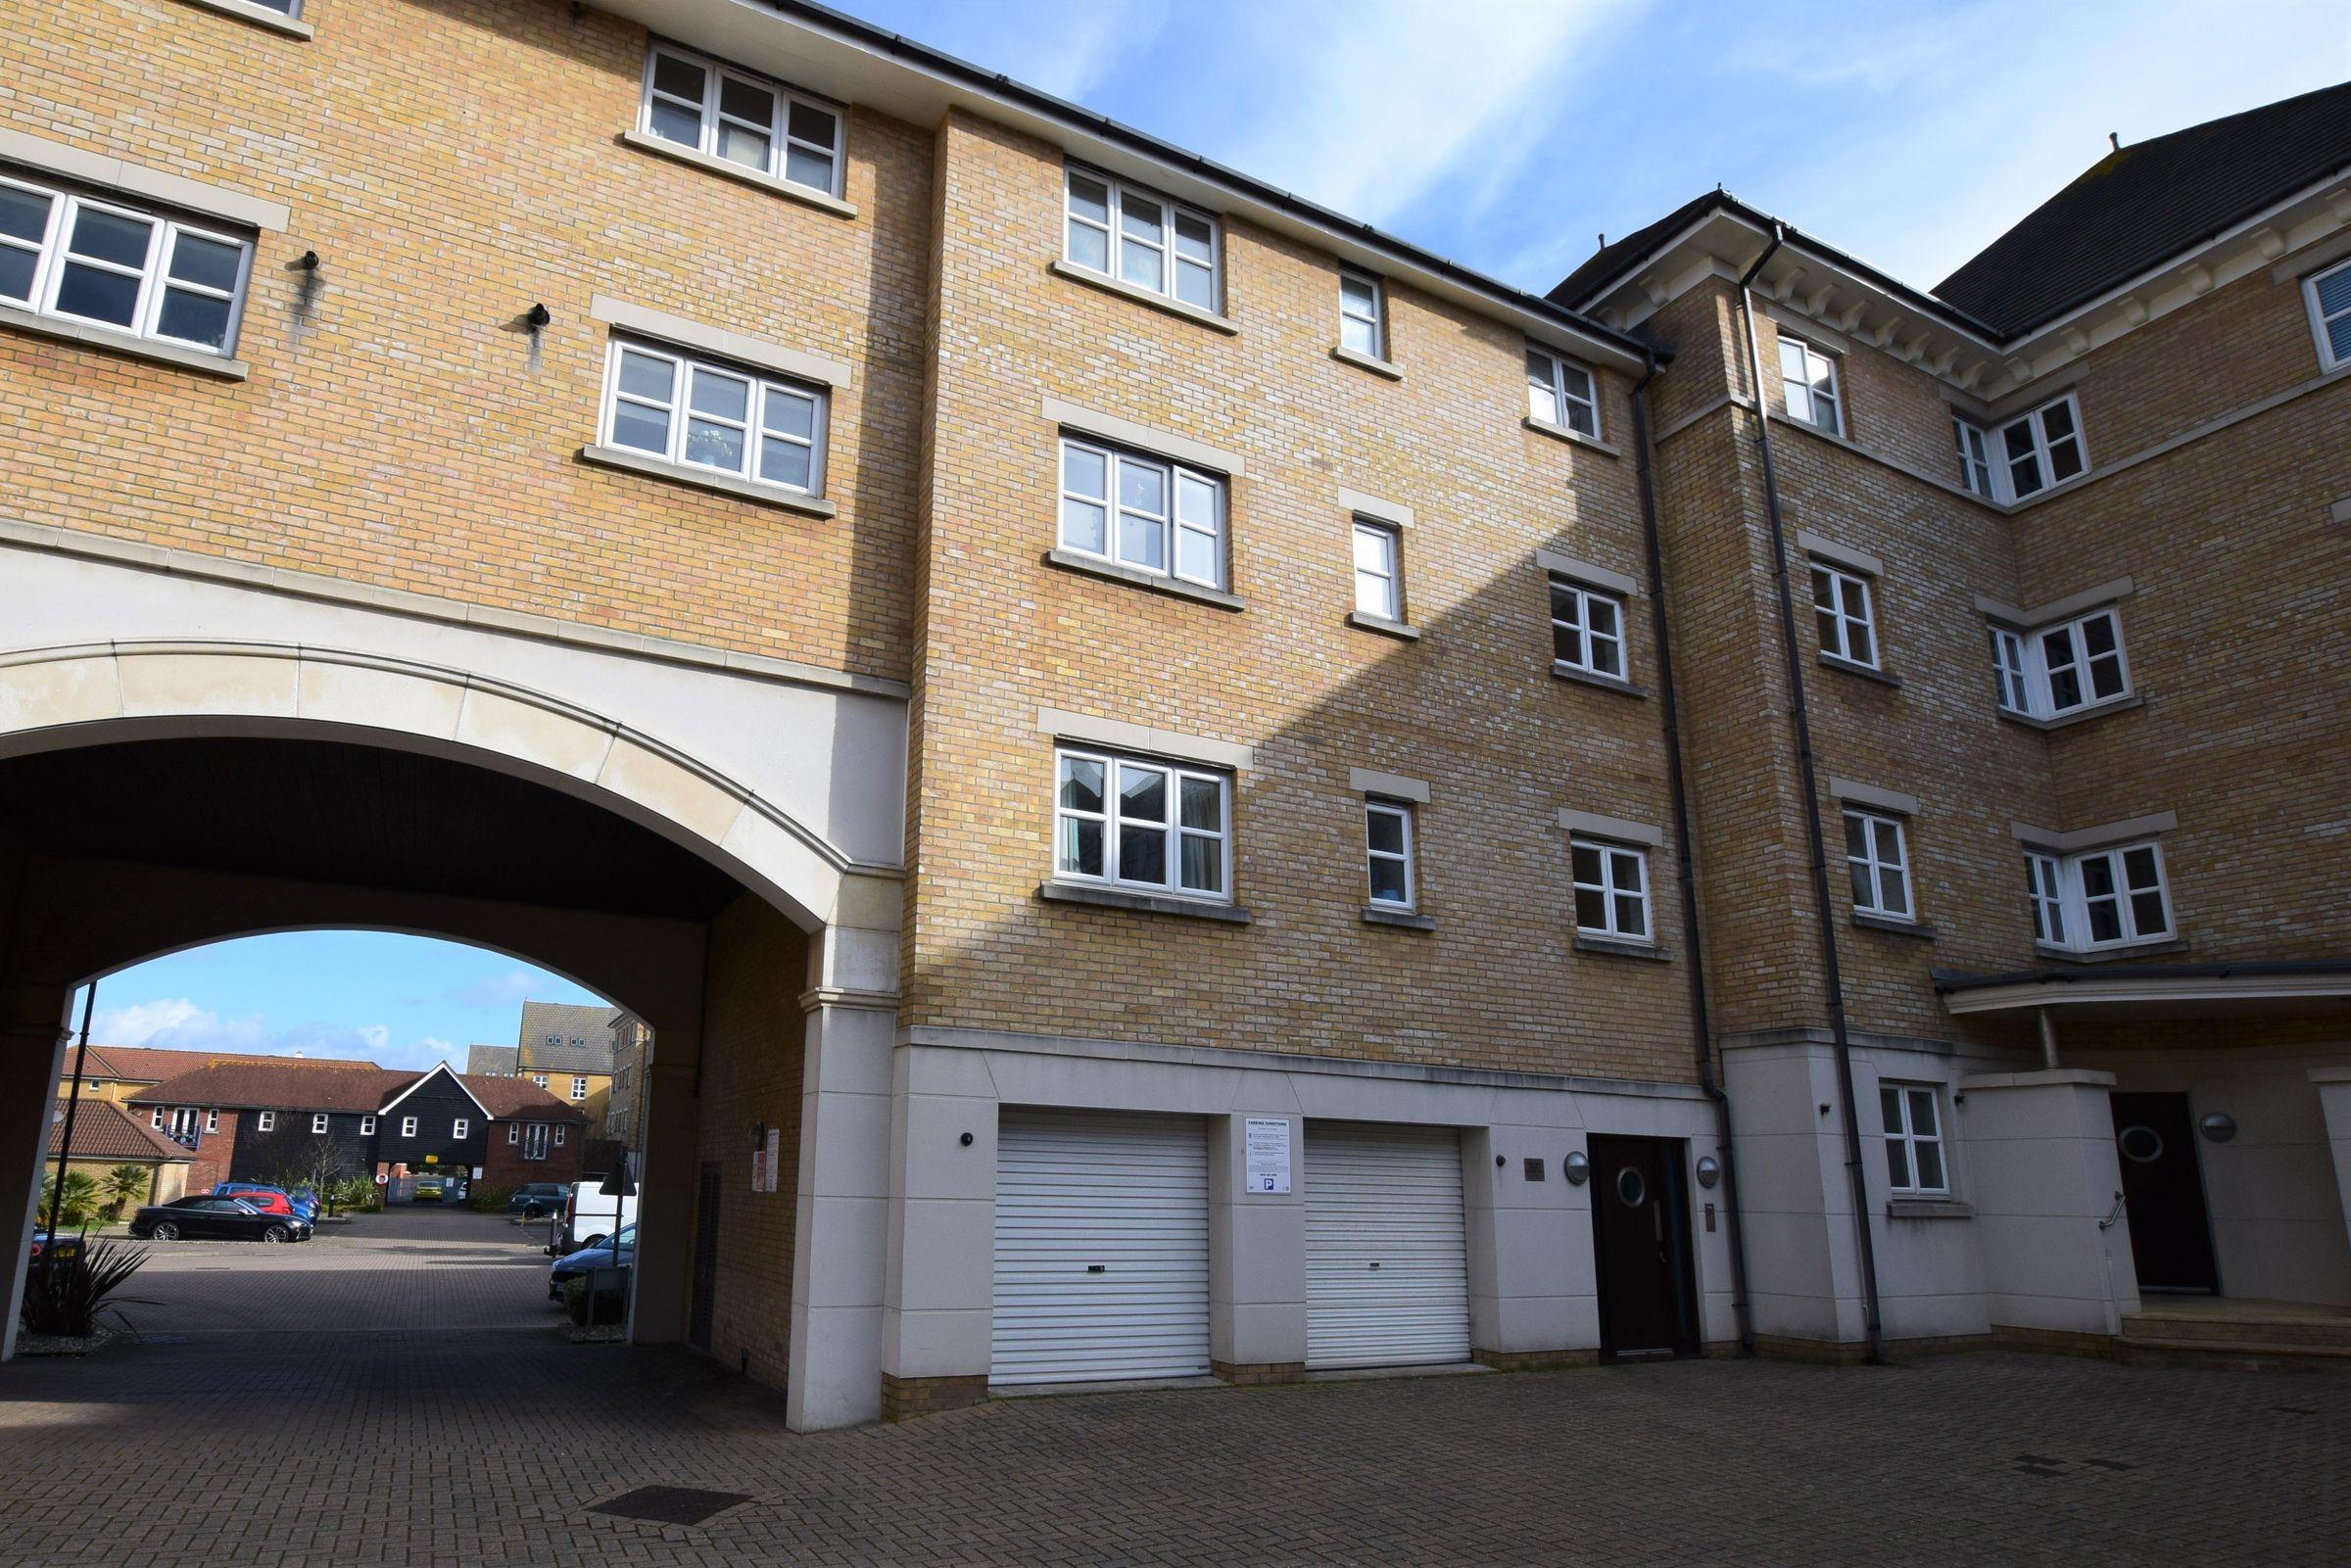 Property photo 1 of 12. Elevation